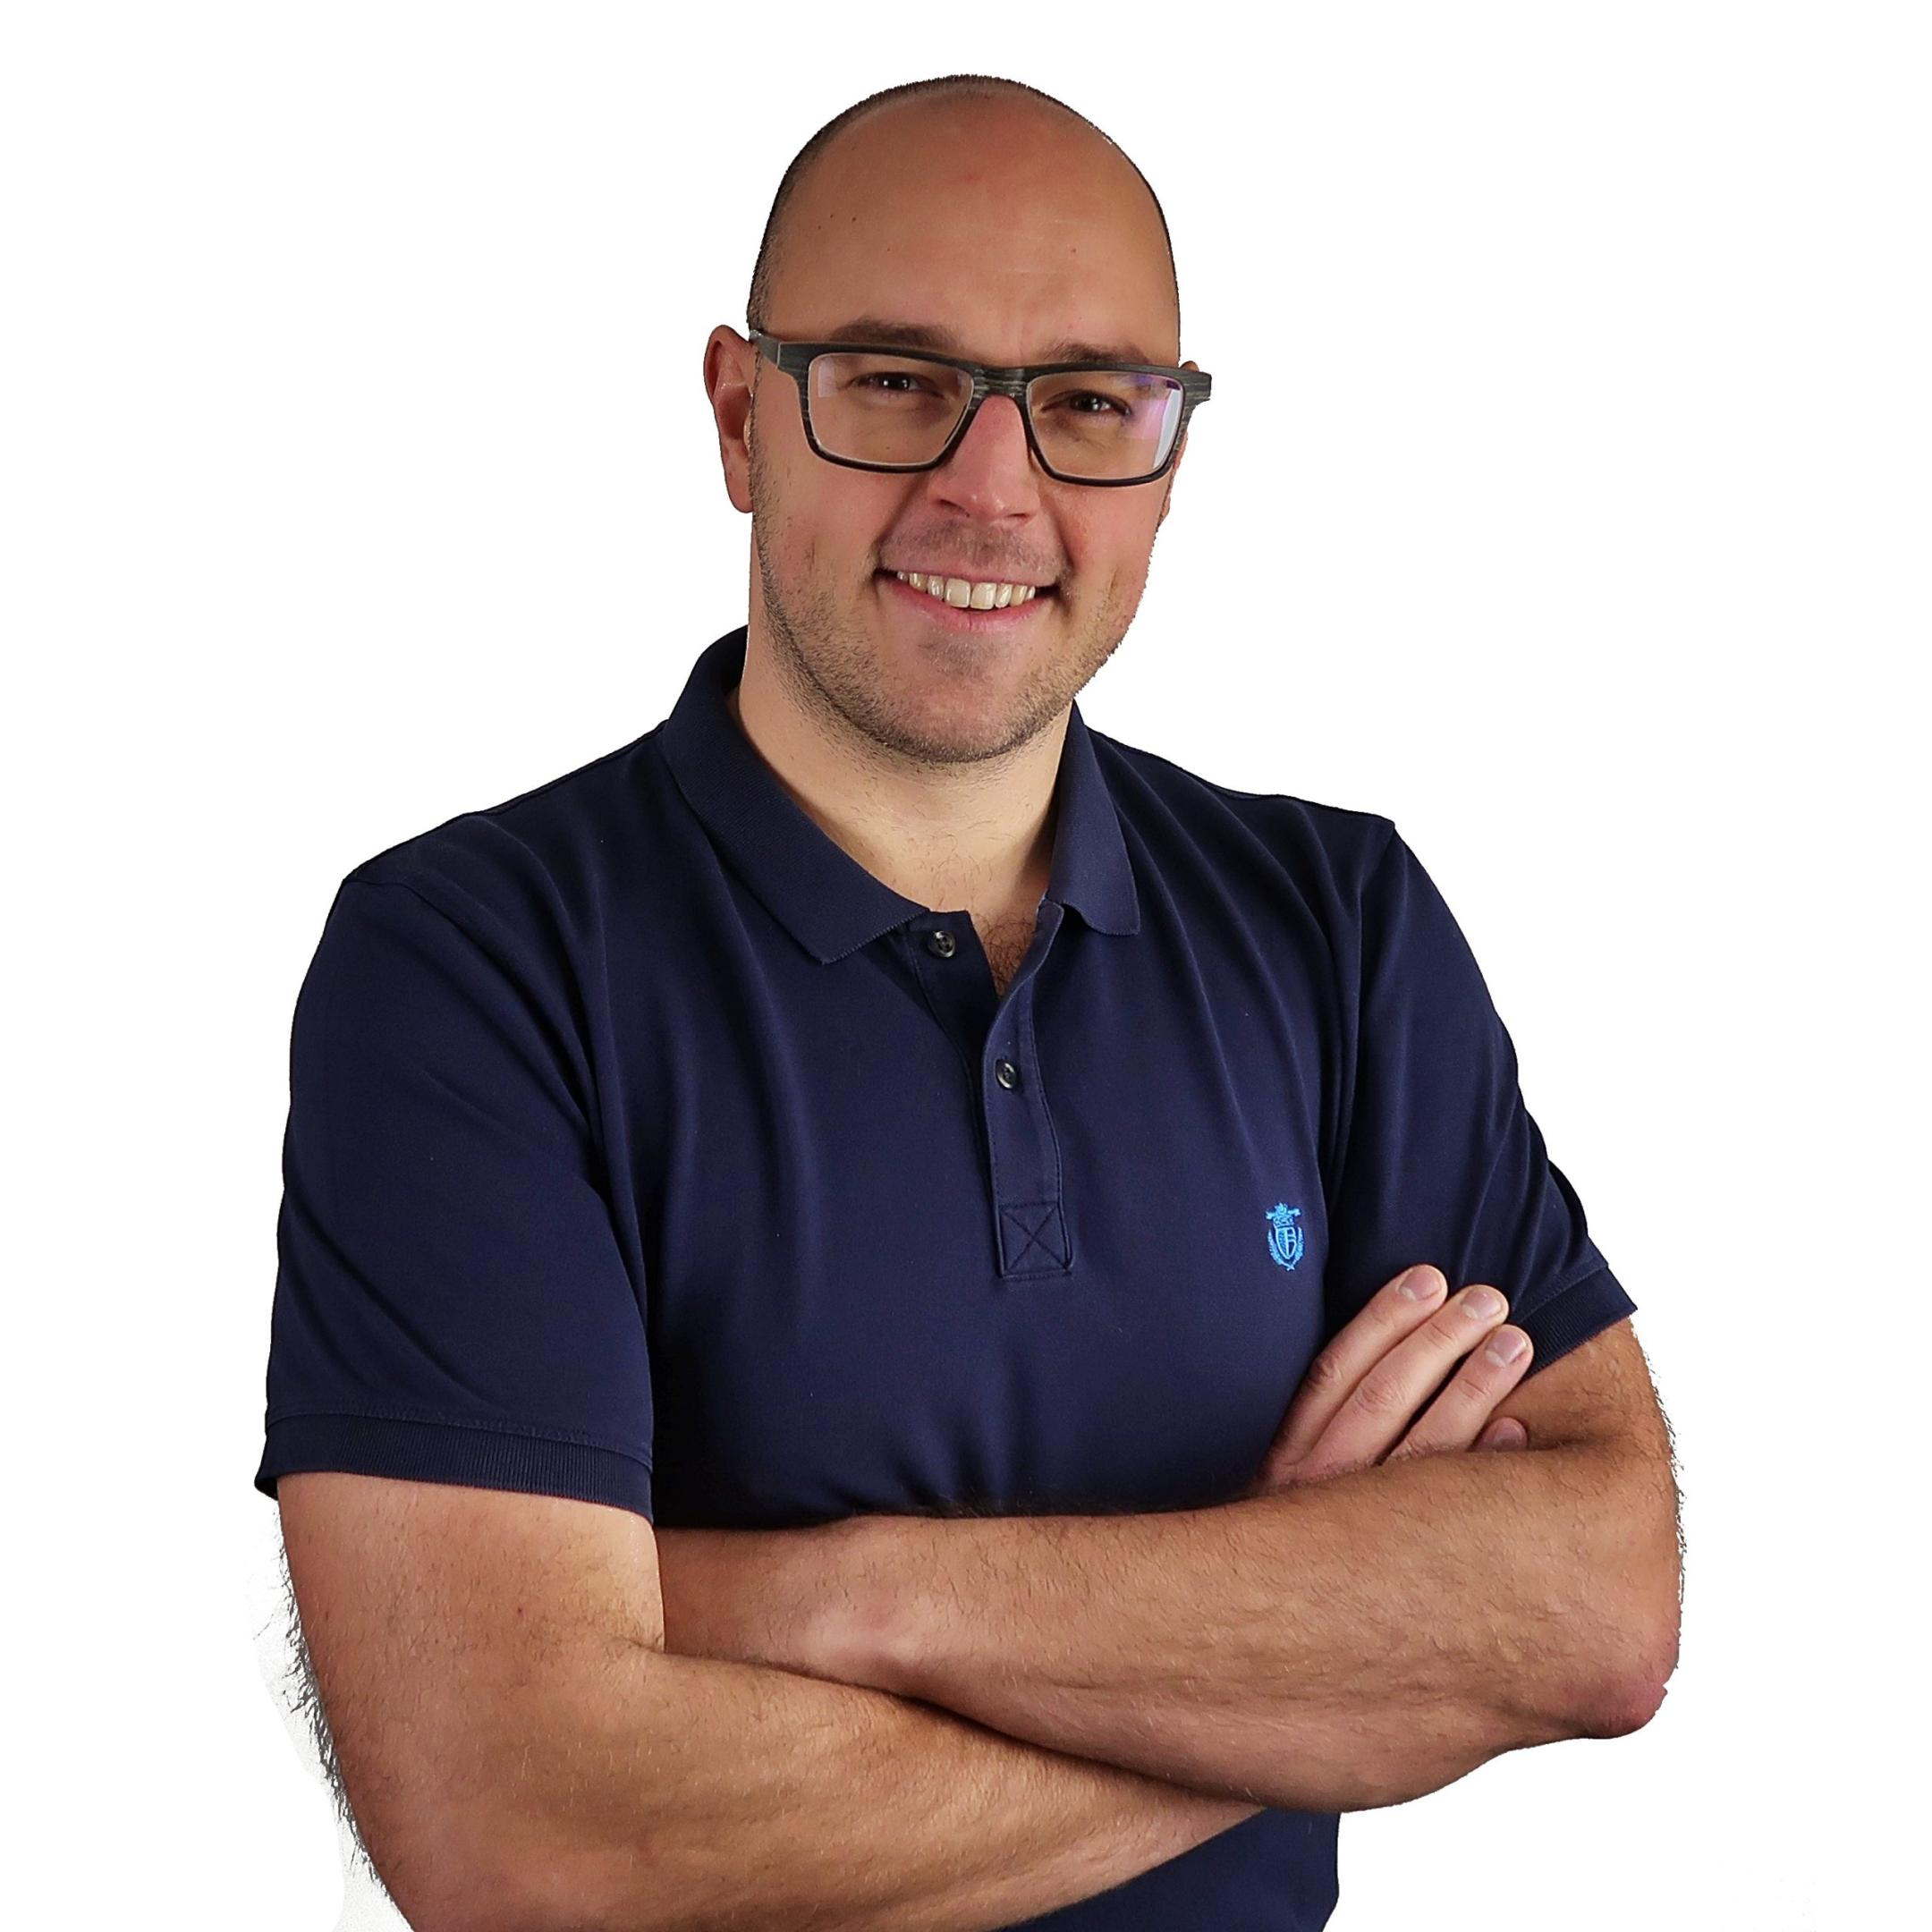 Jan Schmeckenbecher